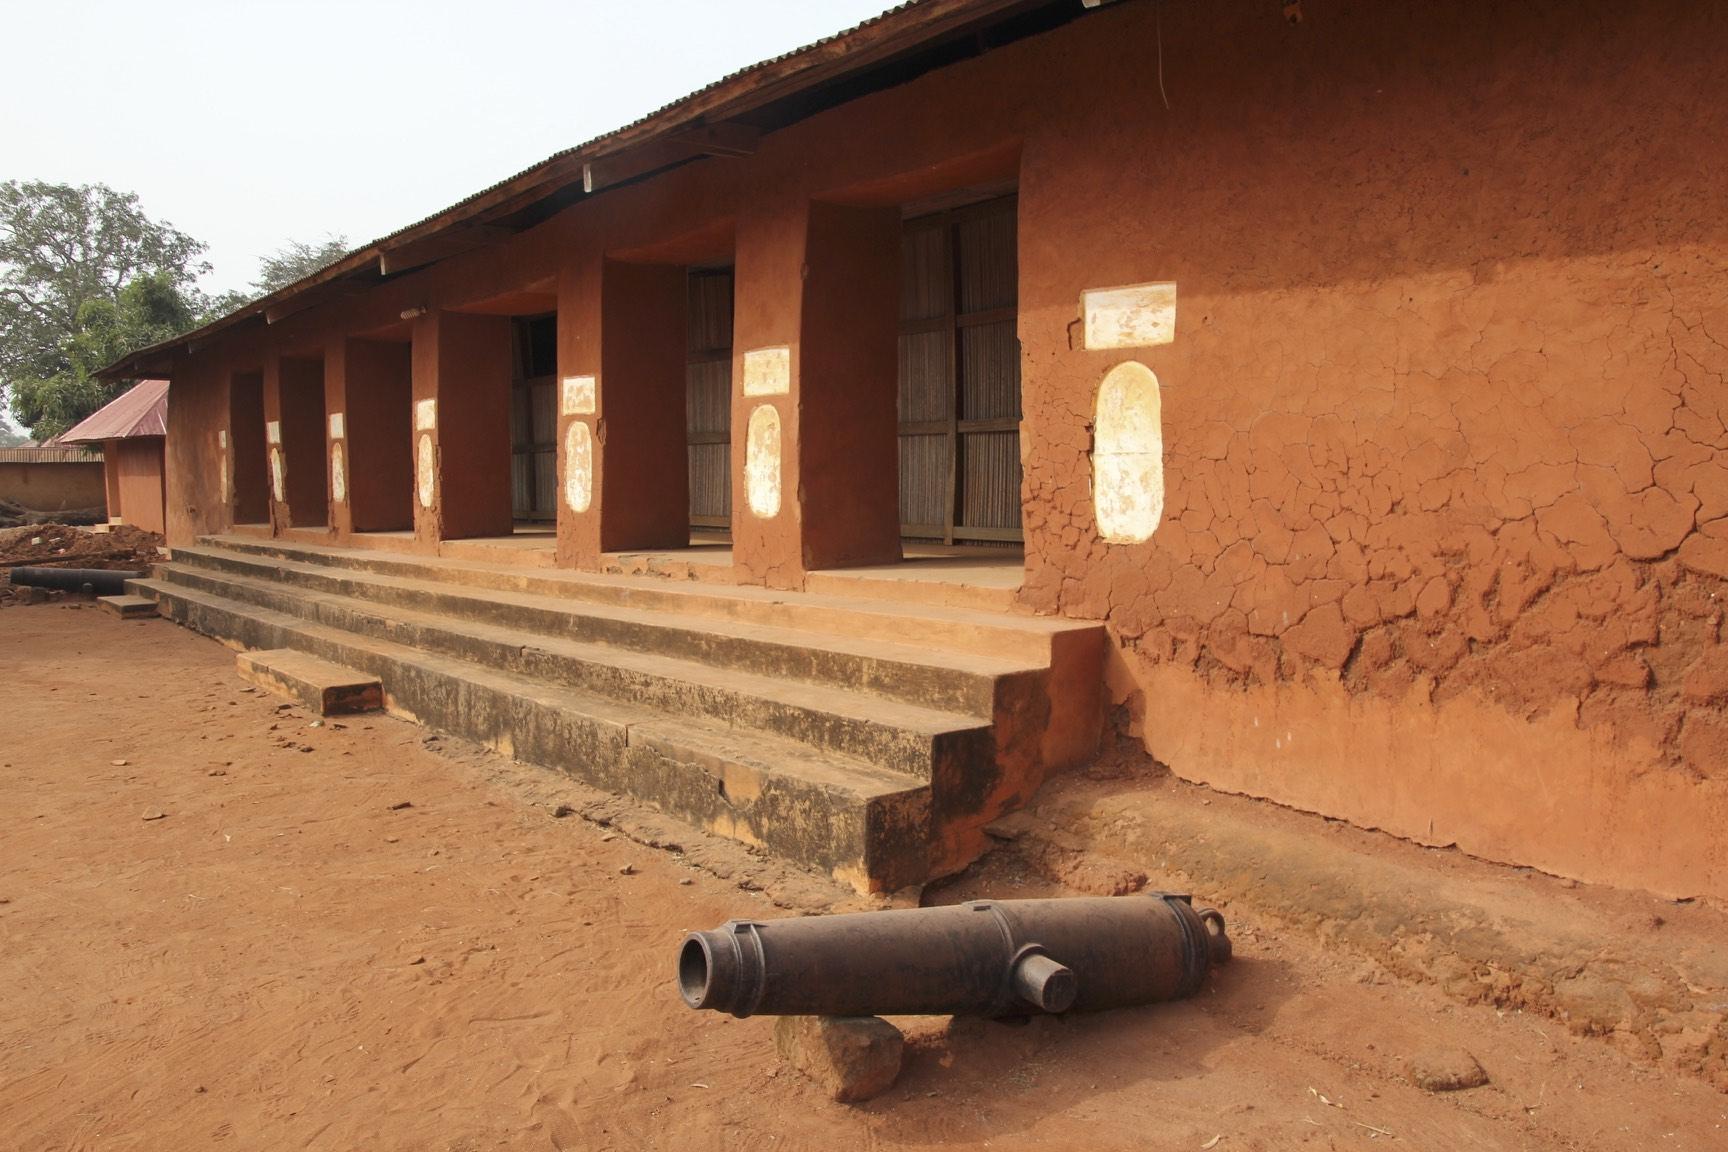 The Royal Palaces of Dahomey, Togo